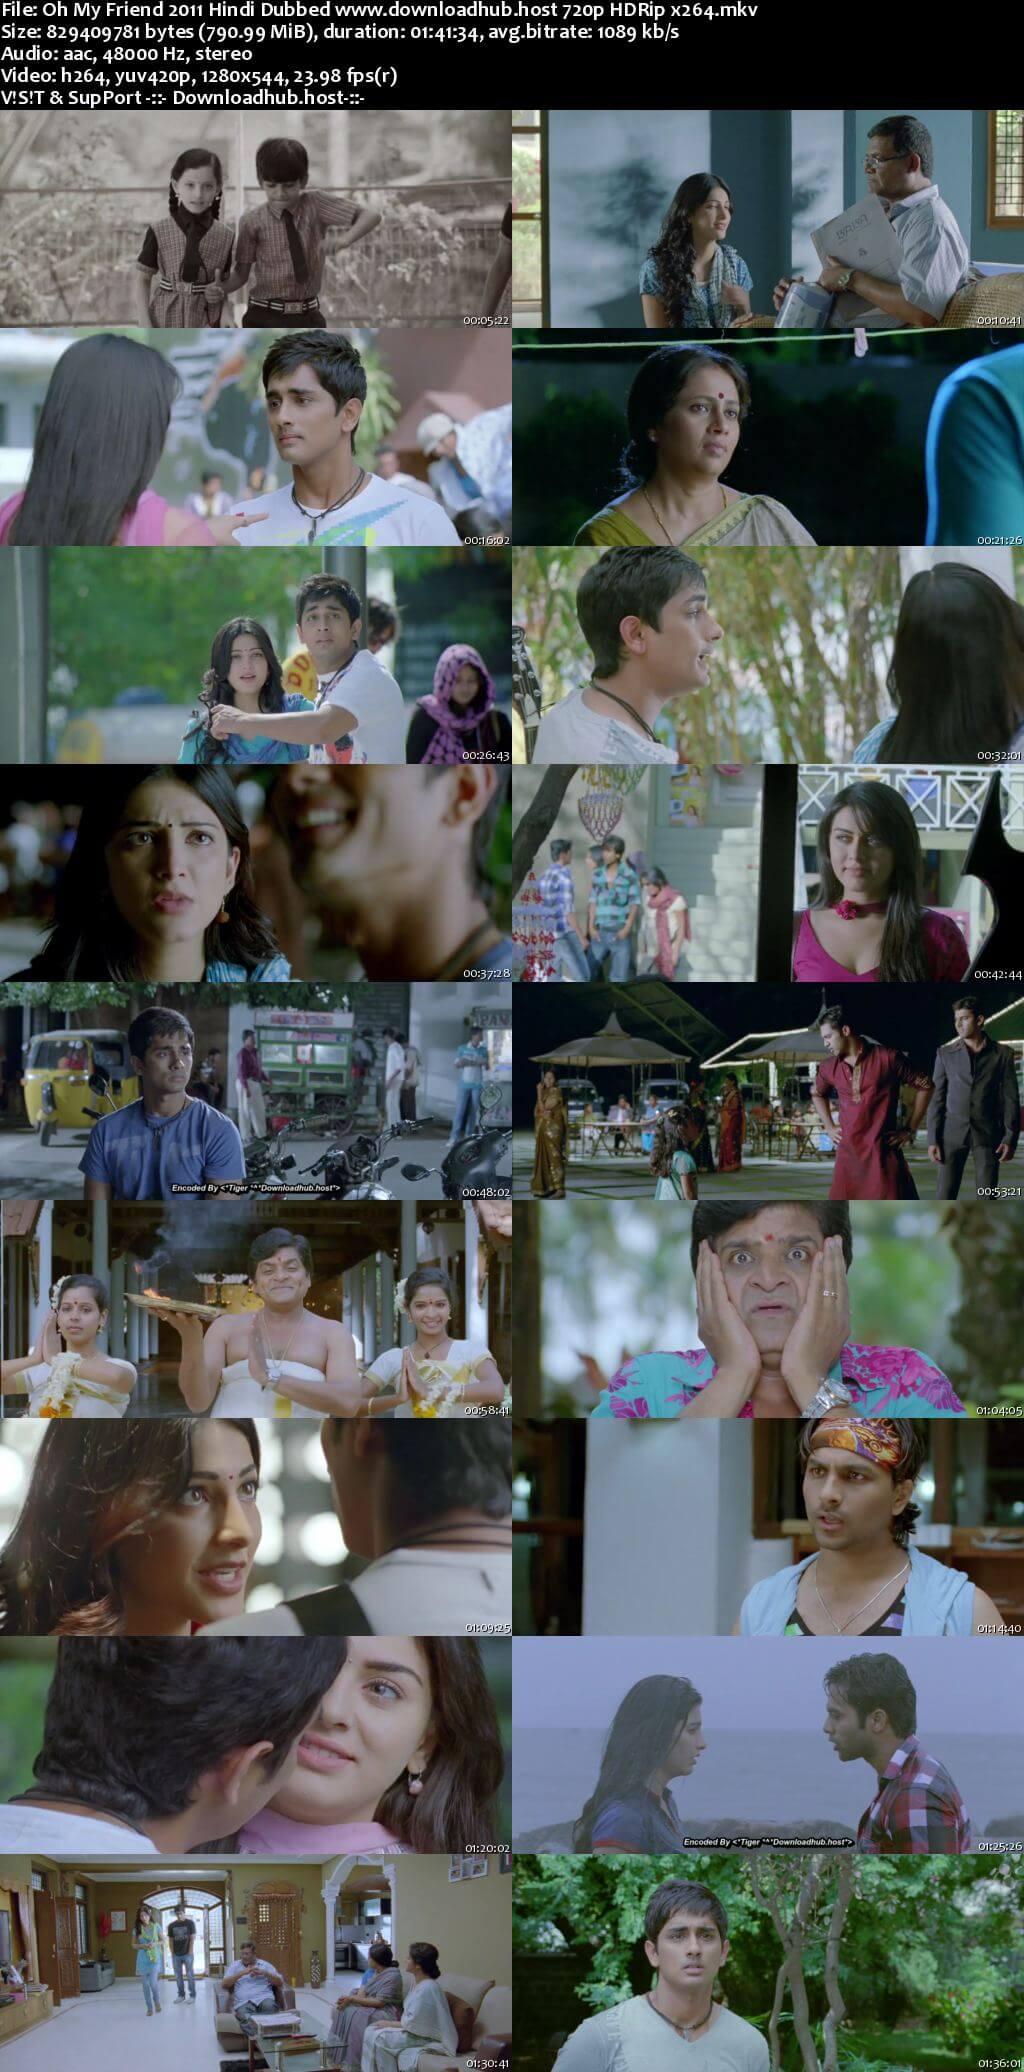 Oh My Friend 2011 Hindi Dubbed 720p HDRip x264